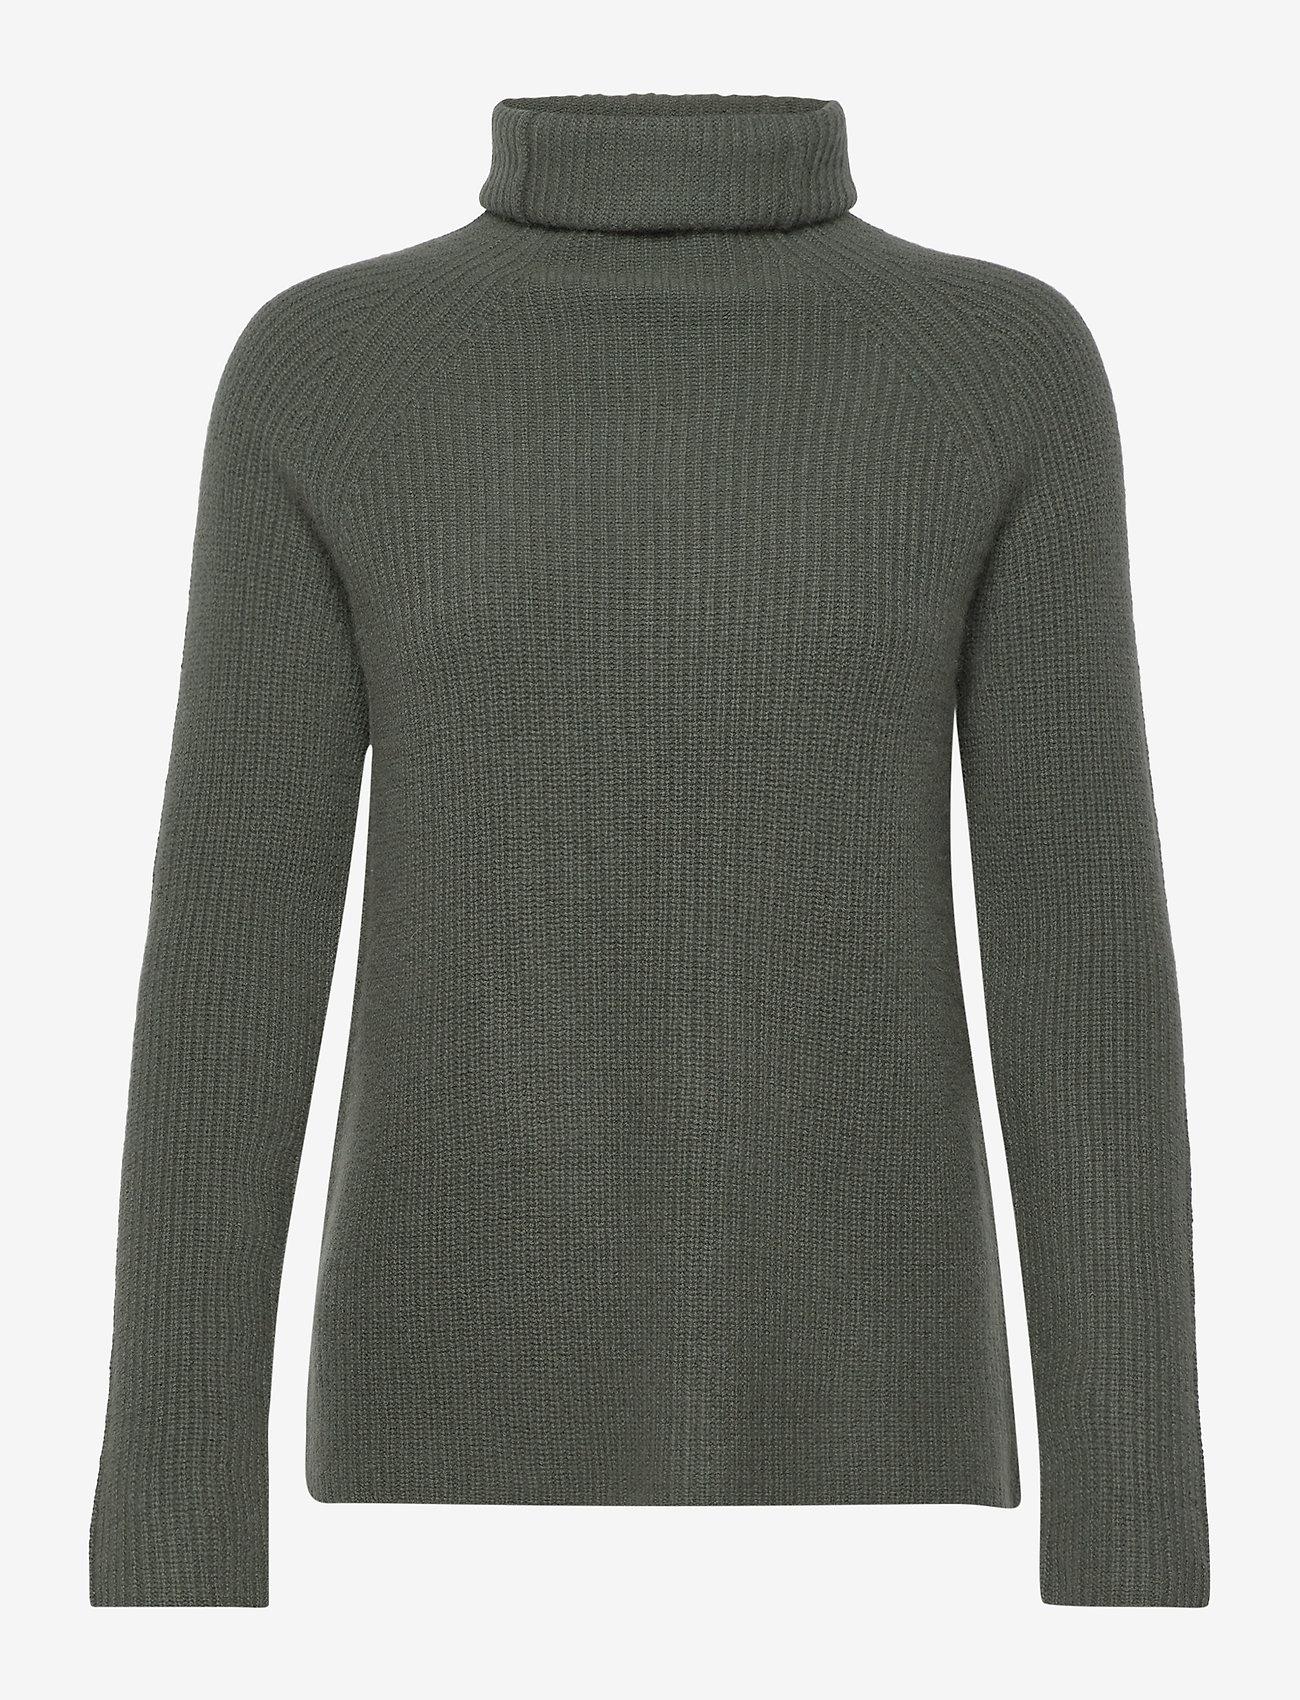 Davida Cashmere - Raglan Rib Loose Fit Sweater - cashmere - army green - 1